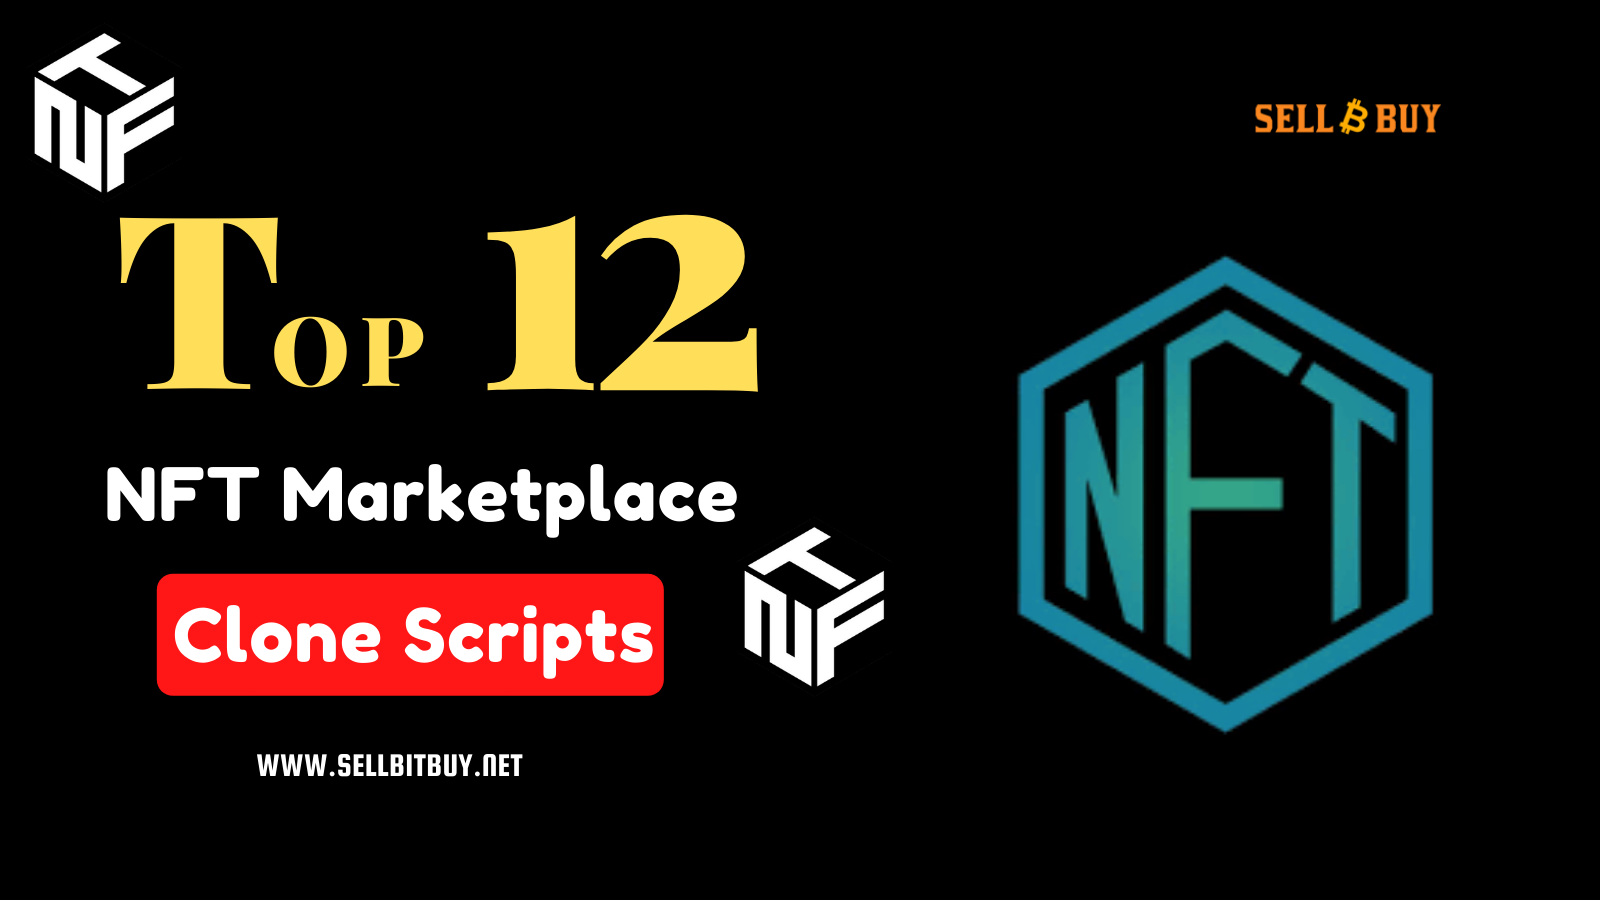 NFT Marketplace Clone Script - To Start A P2P NFT Marketplace Like OpenSea, Rarible, etc,